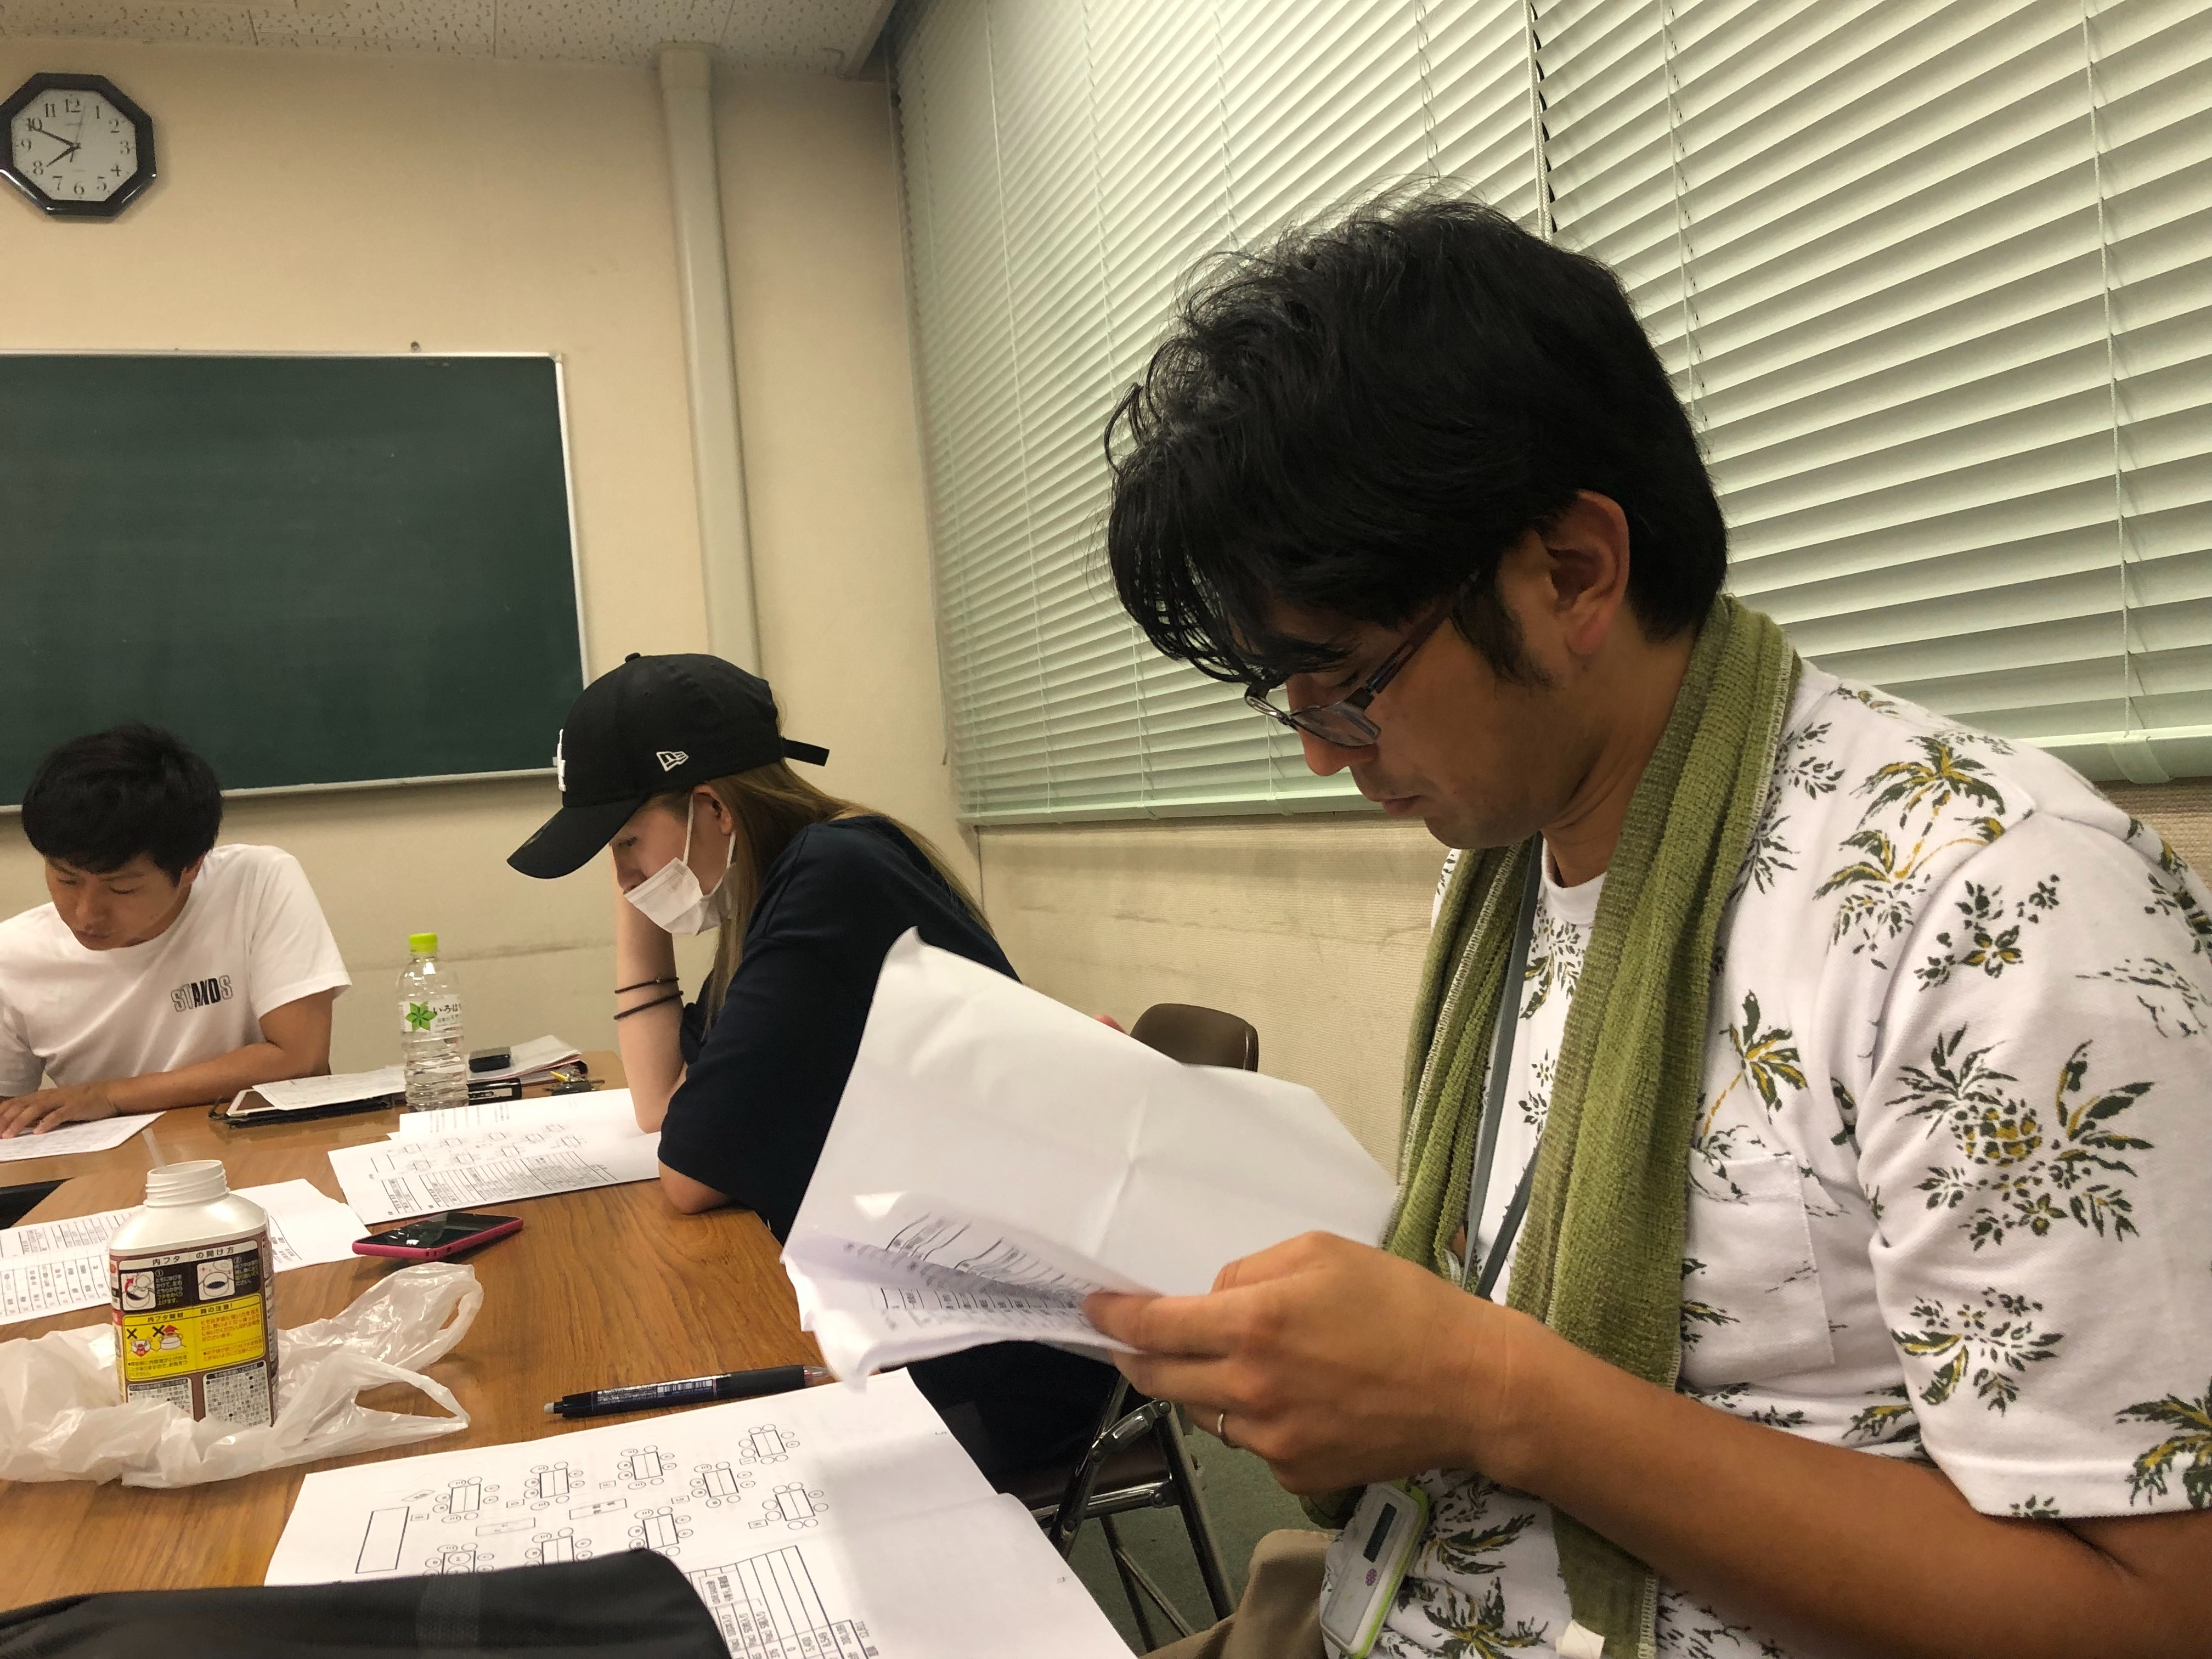 f:id:masanori-kato1972:20190615190223j:image